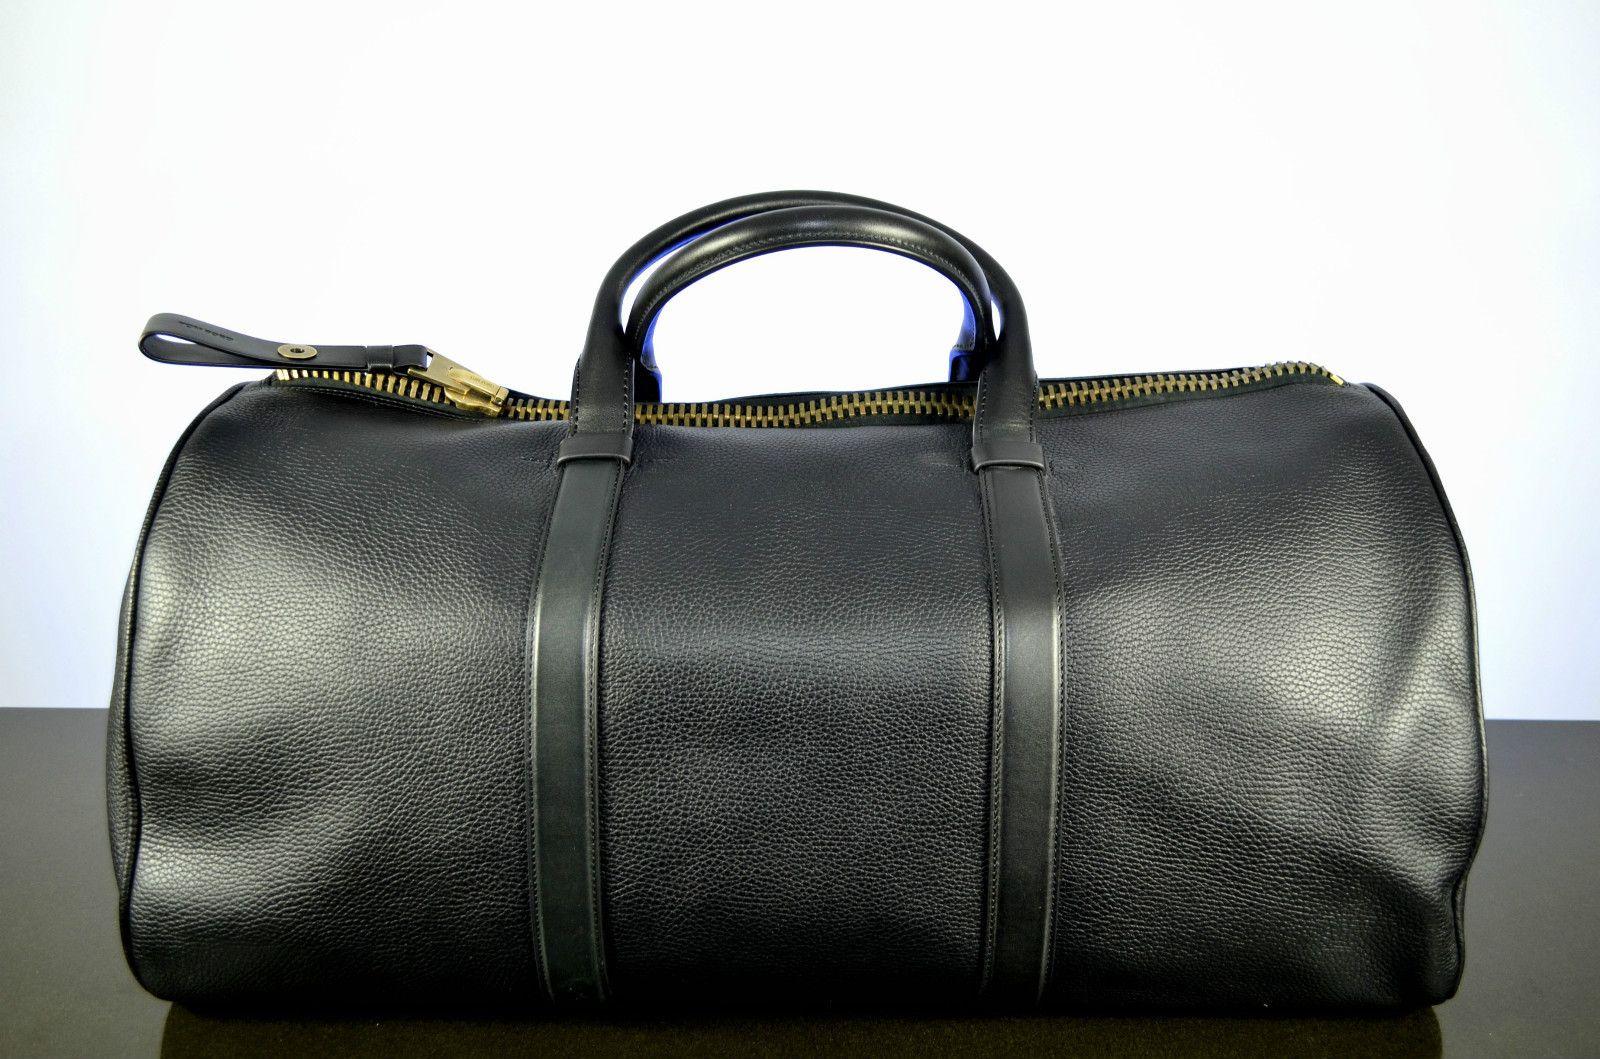 US Men/'s Black Leather Duffle Gym Handbag Travel Luggage Bag School Satchel Bag